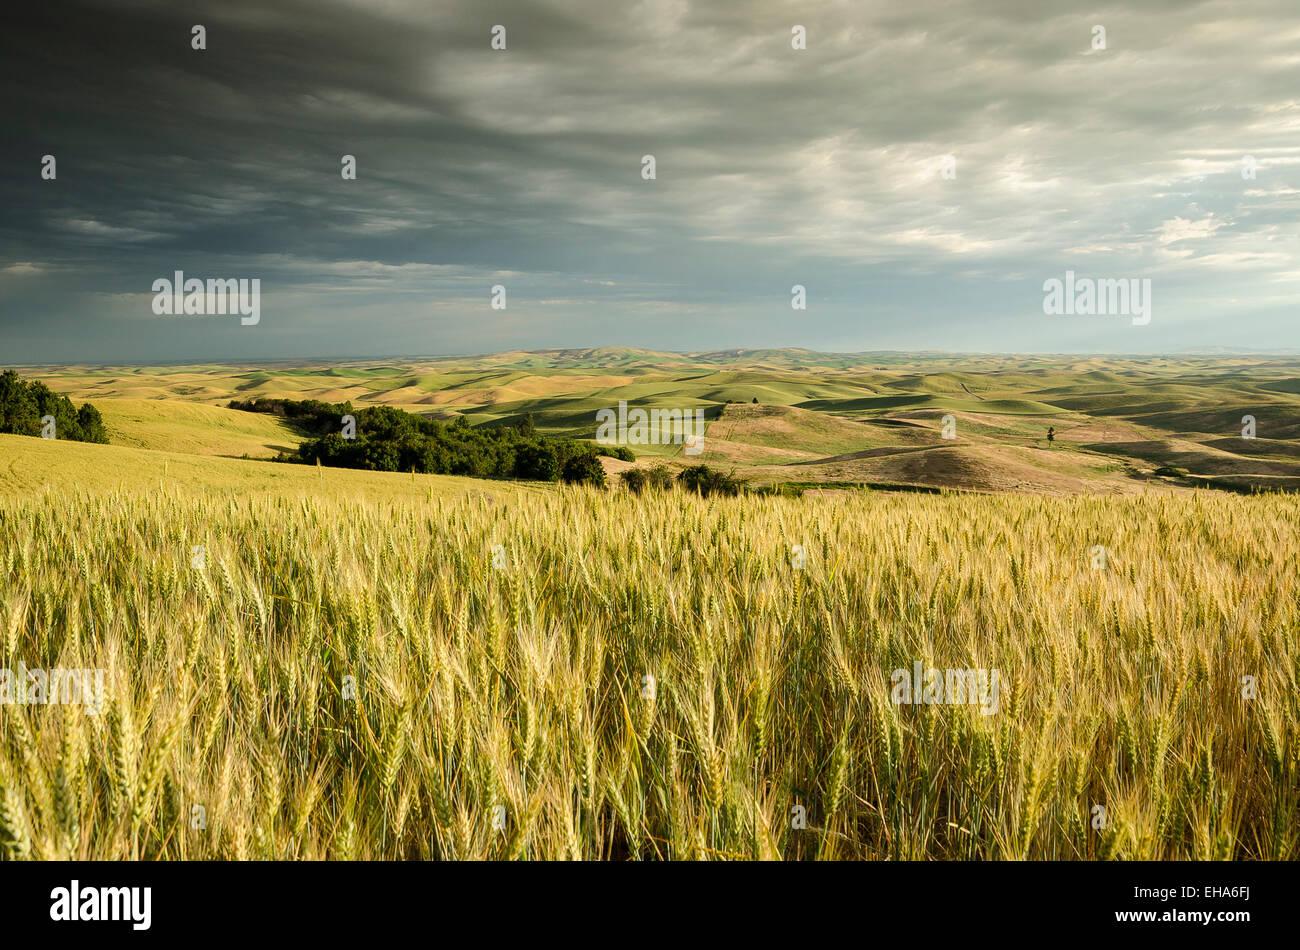 Wheat field, Steptoe Butte, Palouse Region, Washington, USA - Stock Image